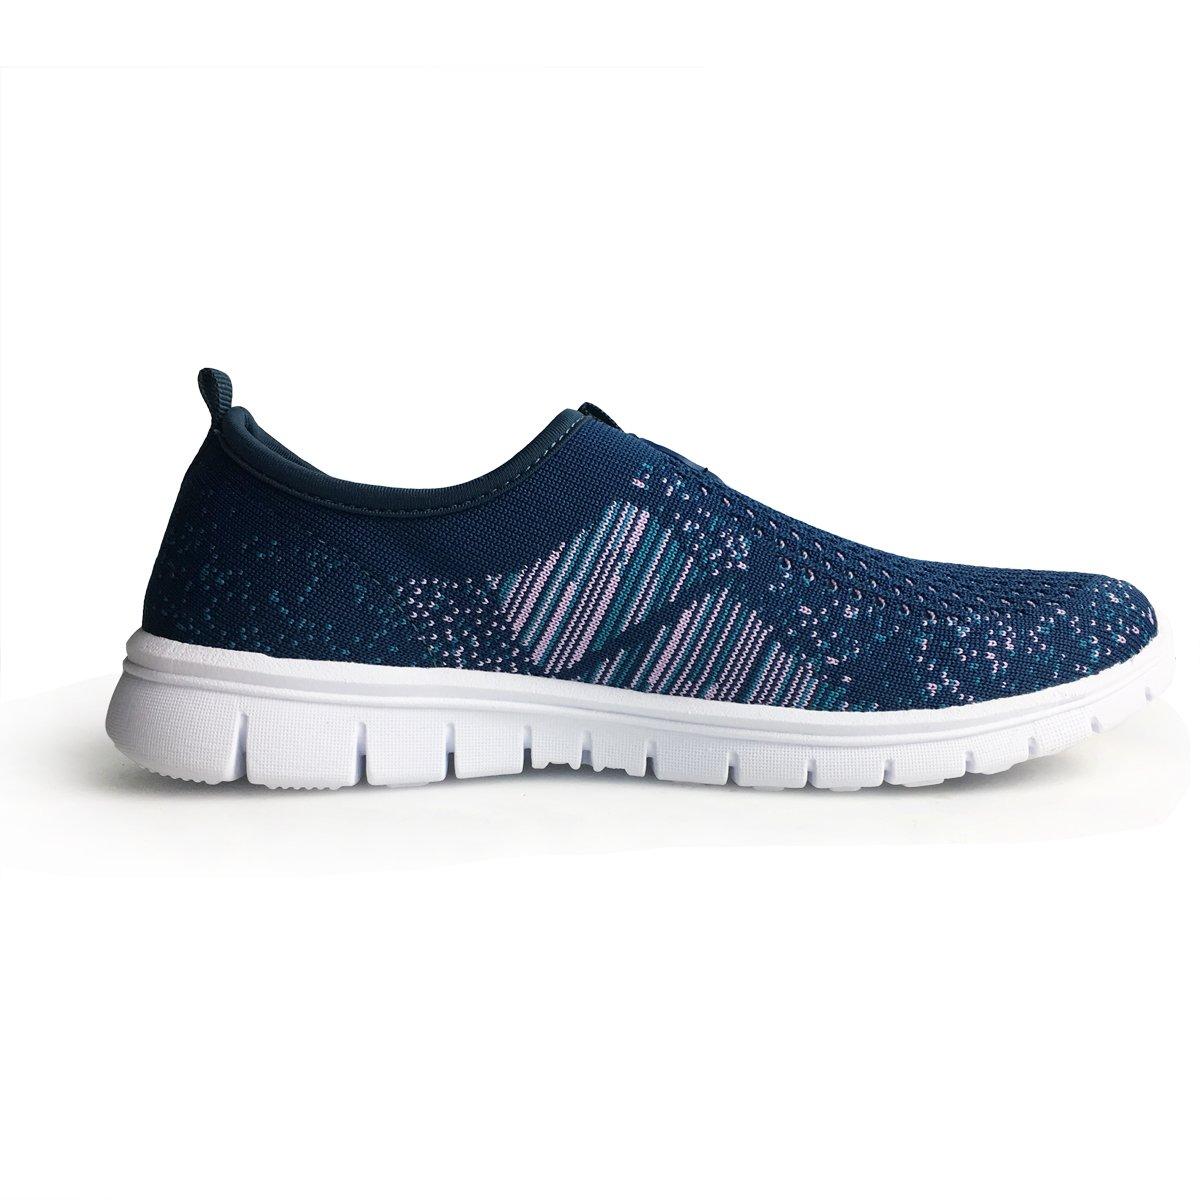 XiaoYouYu Soft Sole Women\'s Flyknit Slip On Walking Shoes Fashion Lightweight Running Sneakers AAX001 Blue, 9.5 B(M) US